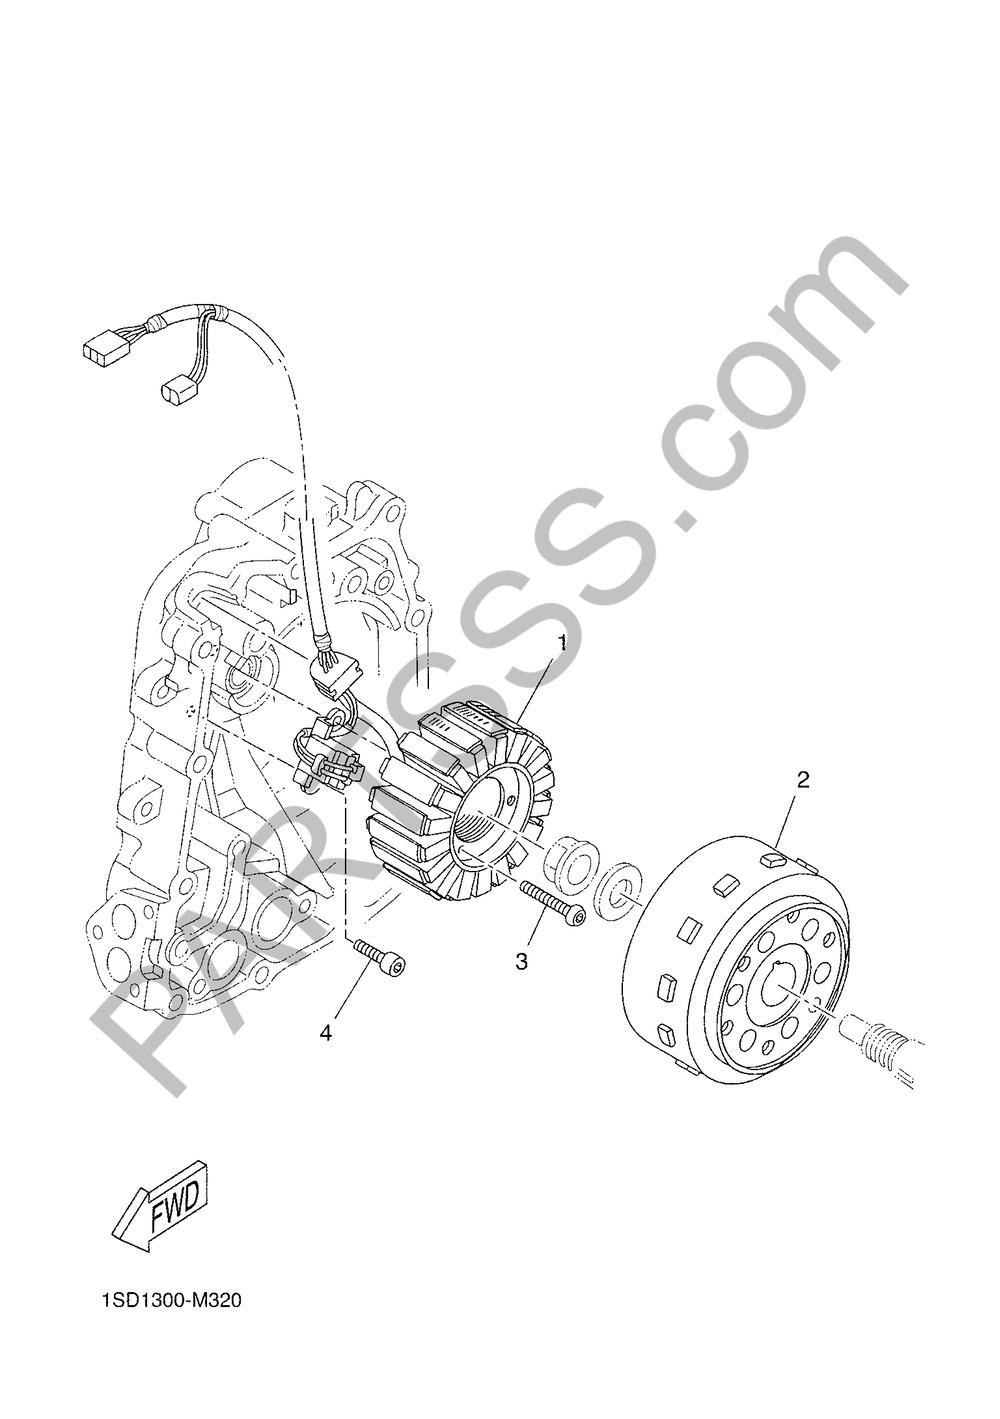 GENERADOR Yamaha X-Max 400 ABS 2018